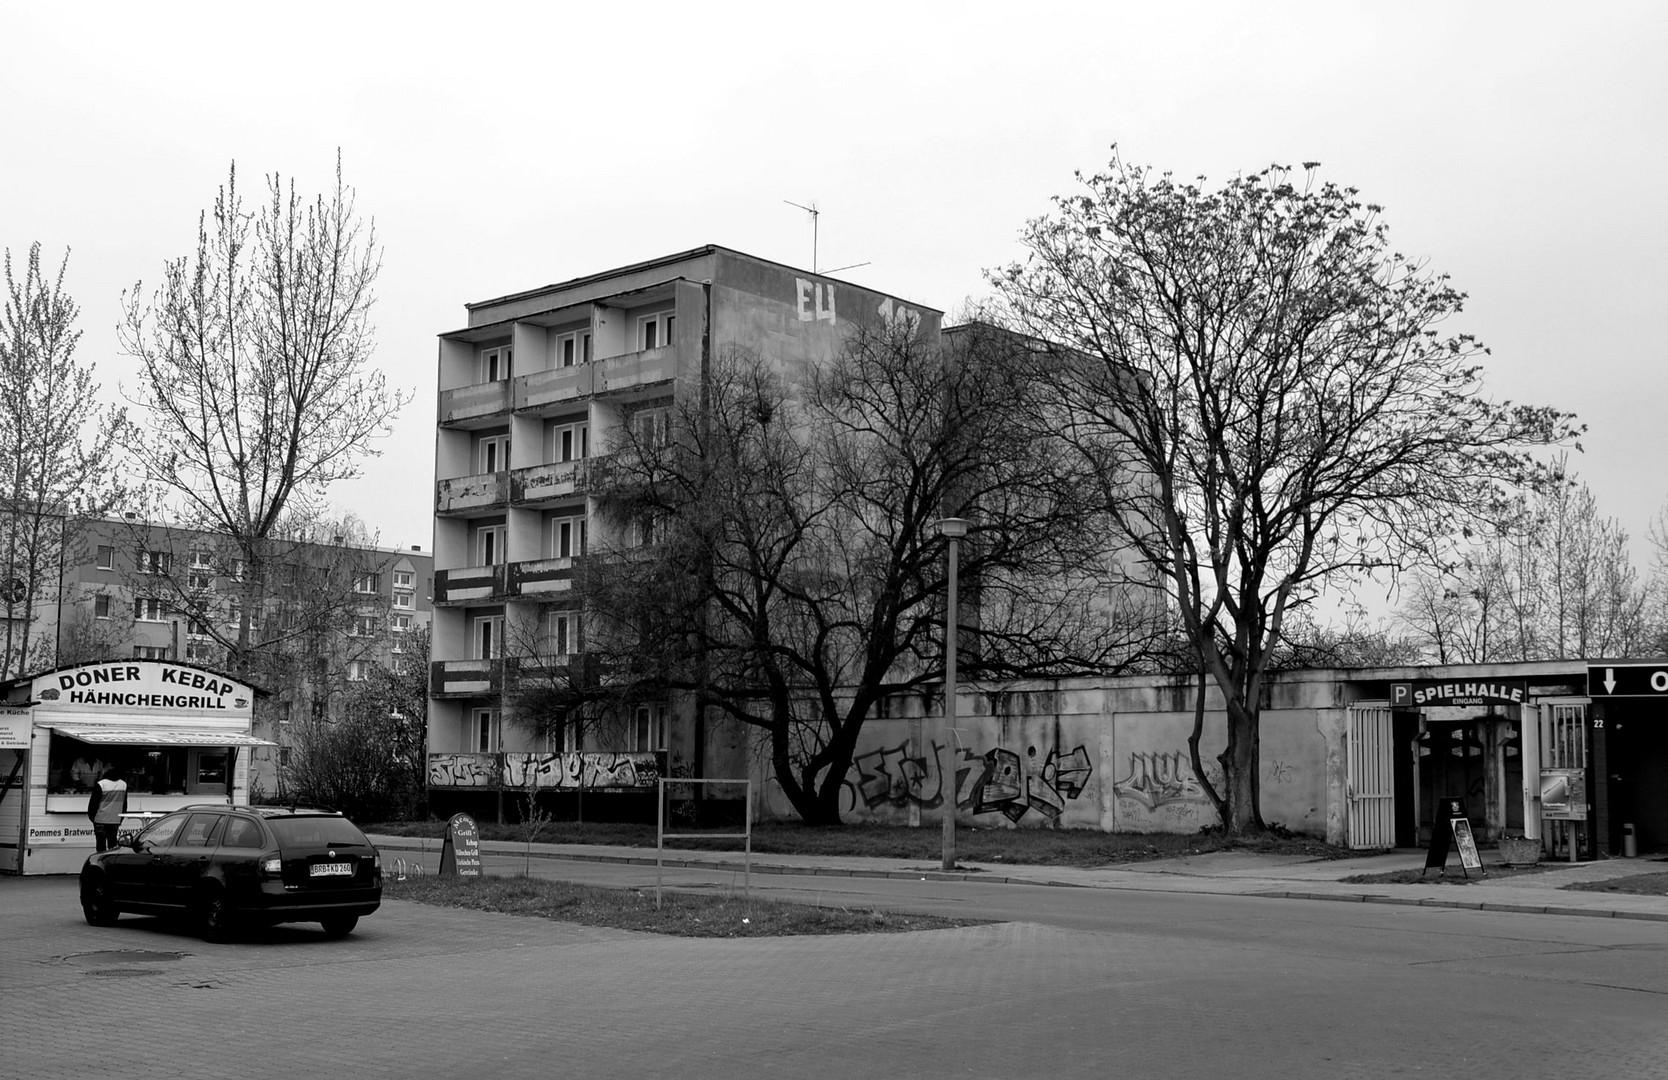 Willkommen in Brandenburg/ Havel II